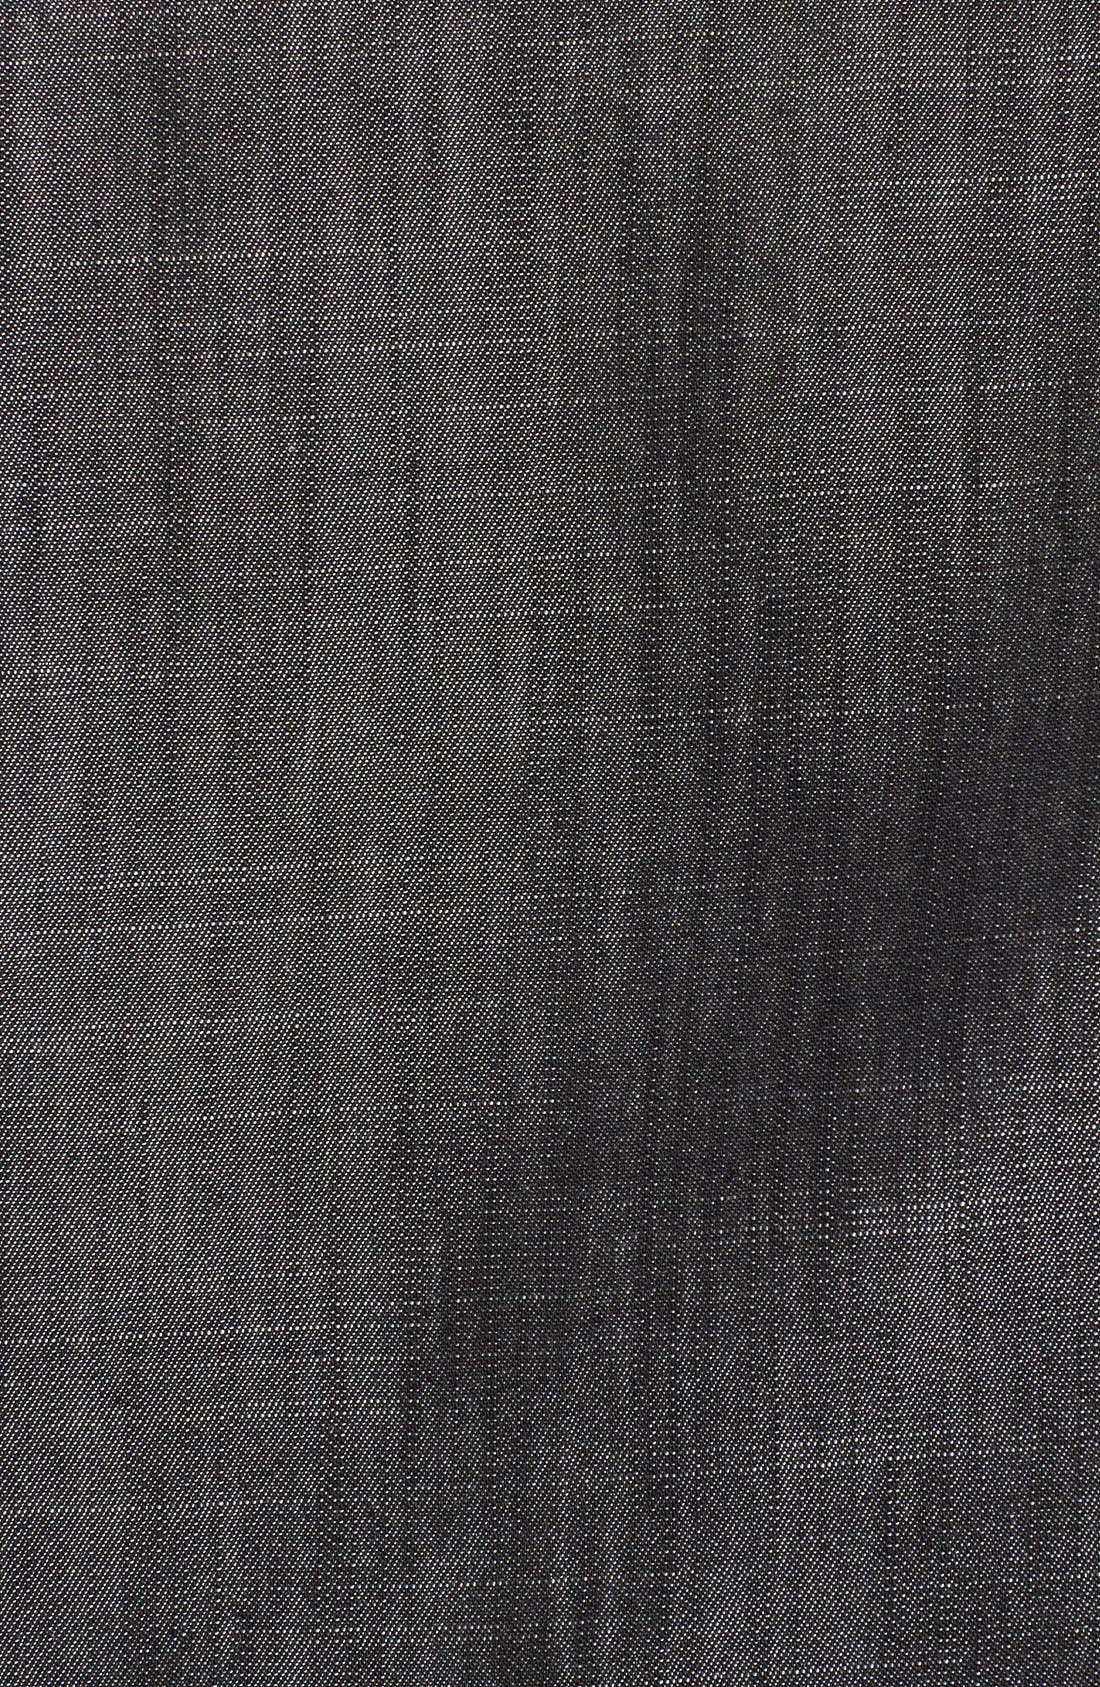 Chambray Long Draped Vest,                             Alternate thumbnail 2, color,                             020